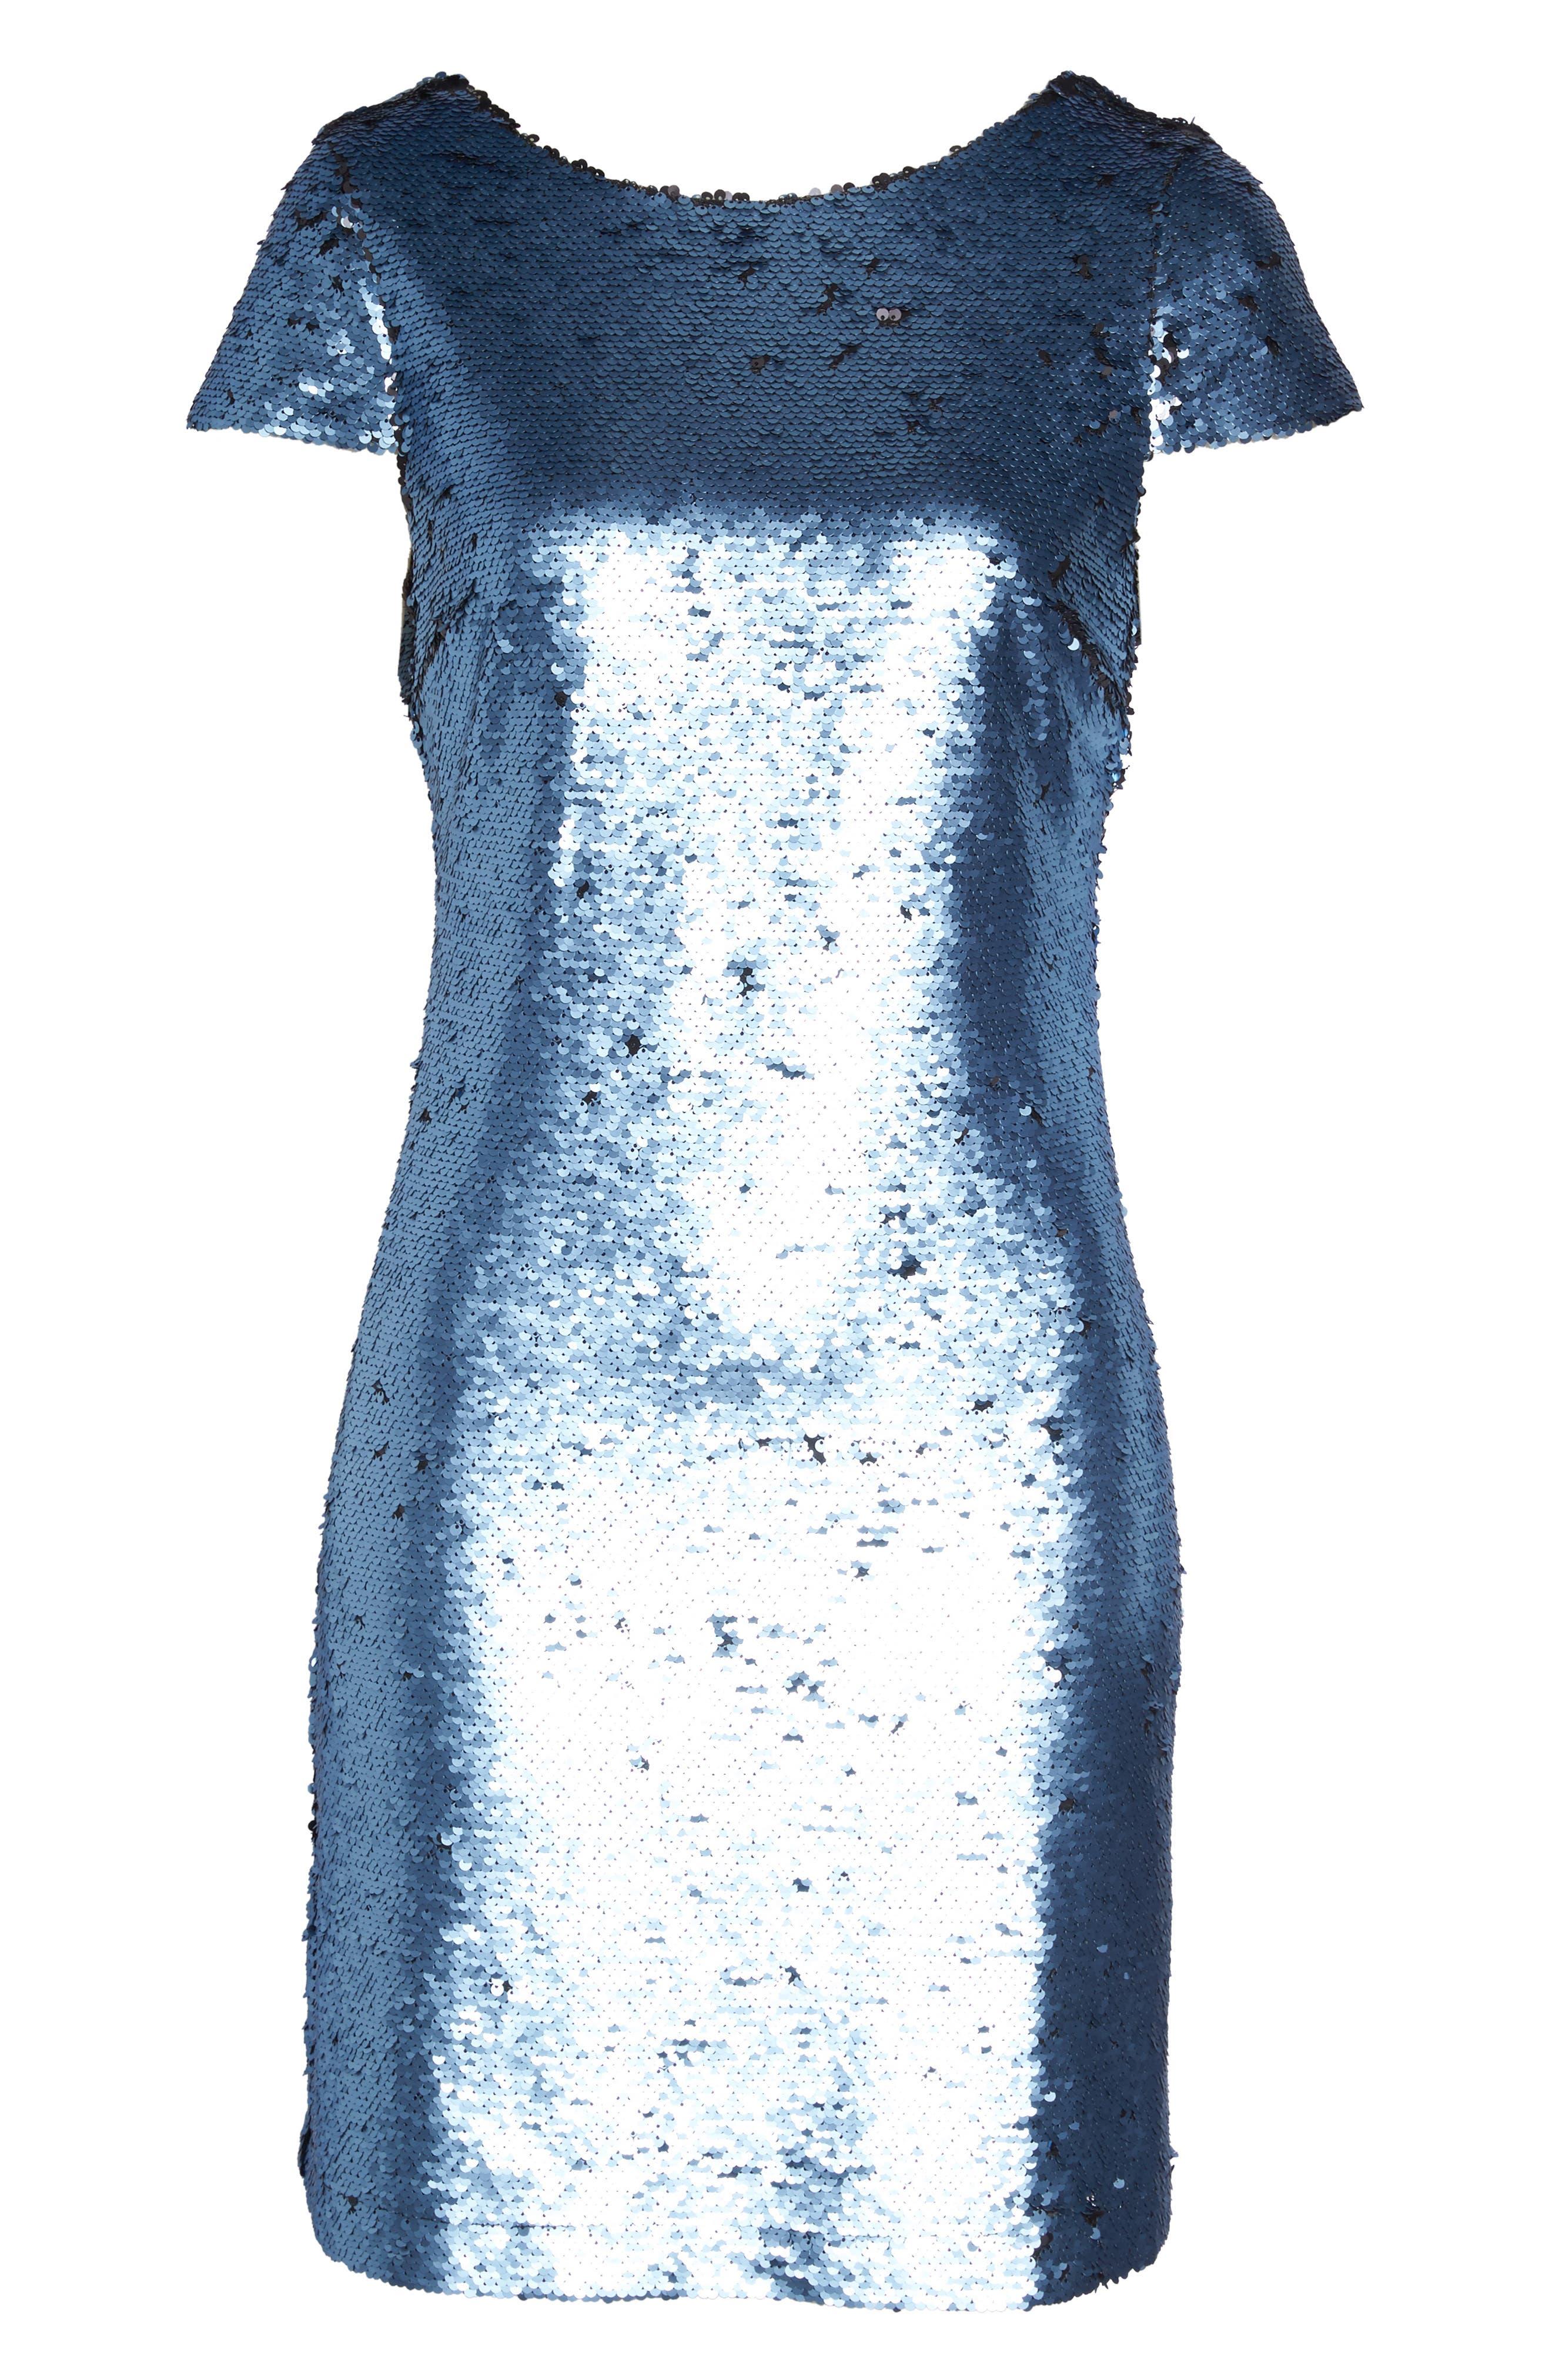 Sequin Sheath Dress,                             Alternate thumbnail 6, color,                             421